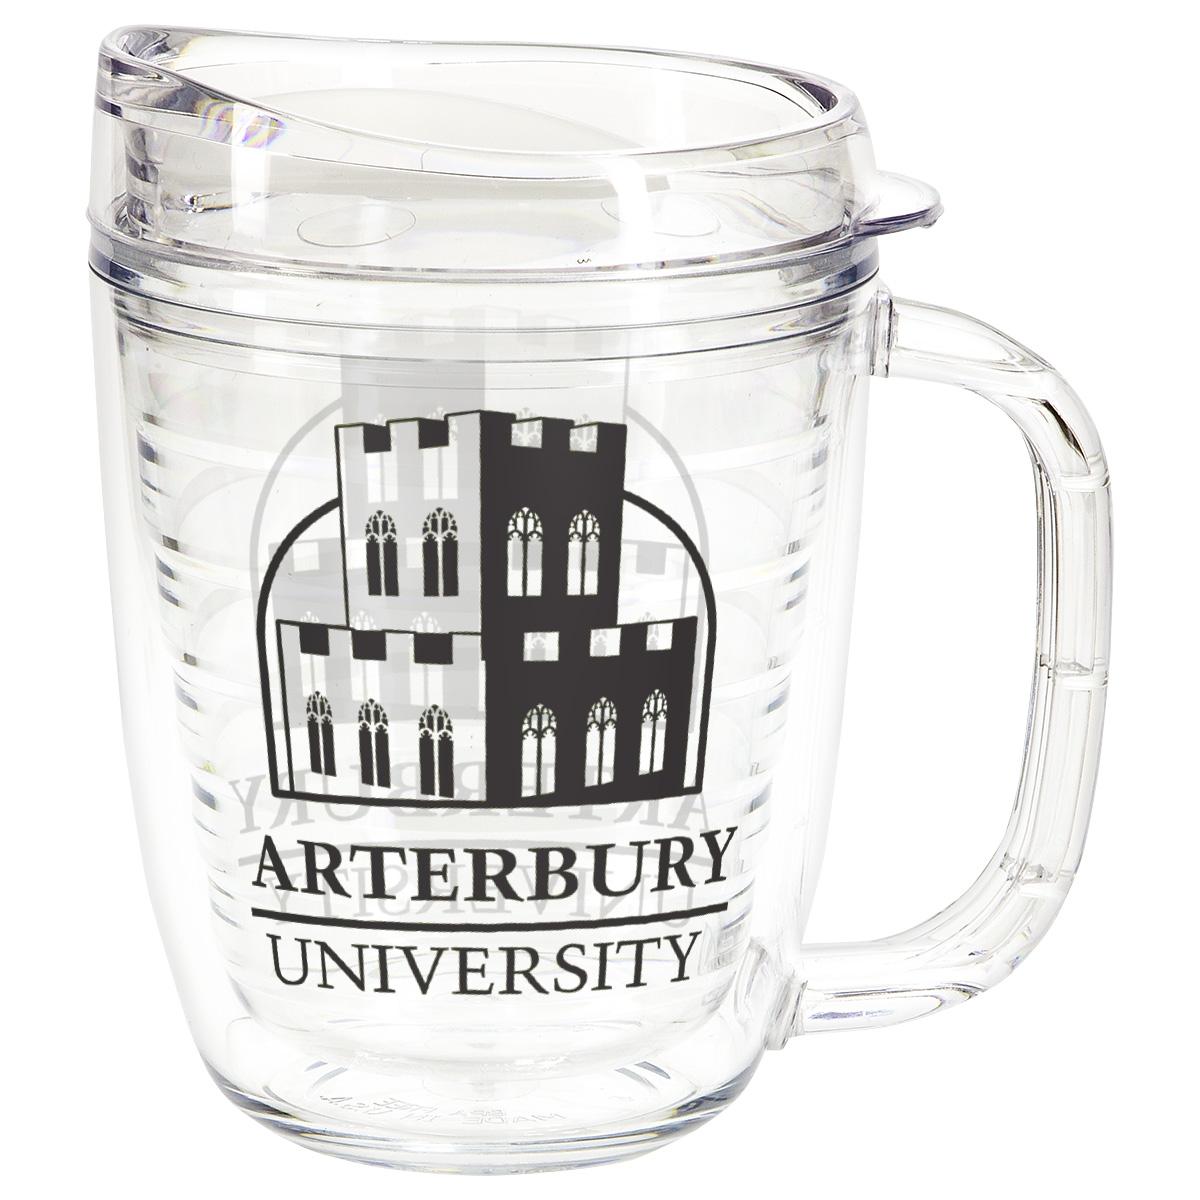 Lakeshore 12 oz Tritan Mug with Translucent Handle + Lid